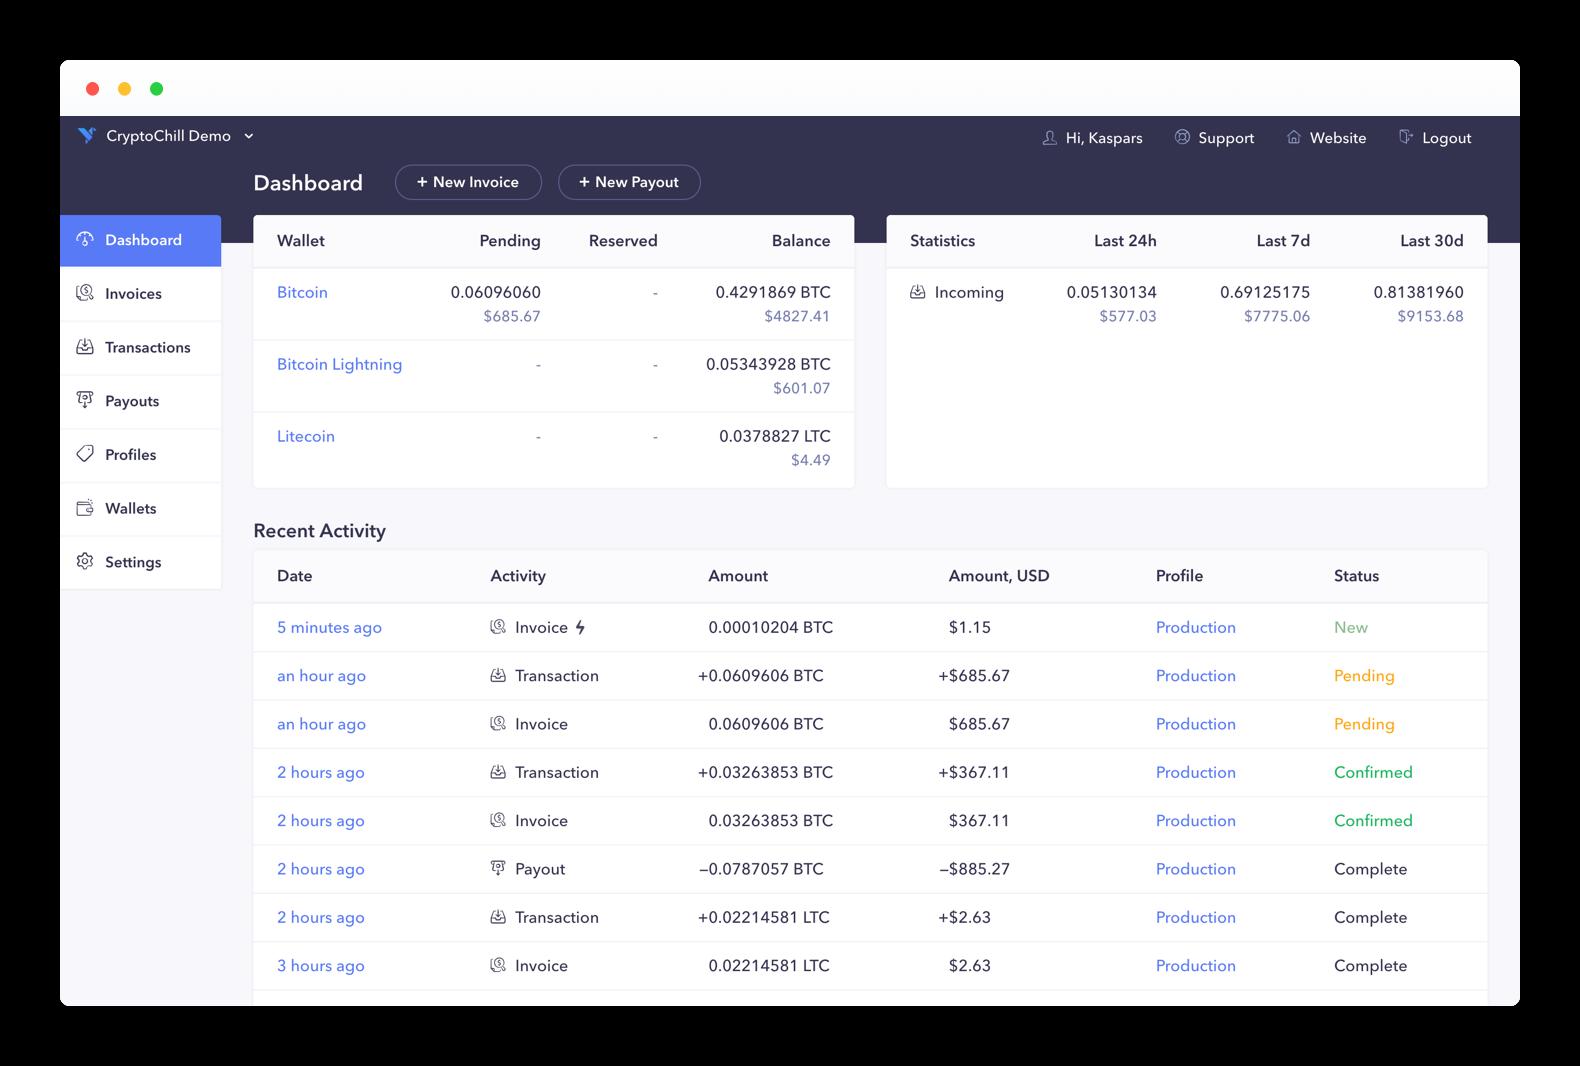 CryptoChill Payment Gateway - Dashboard